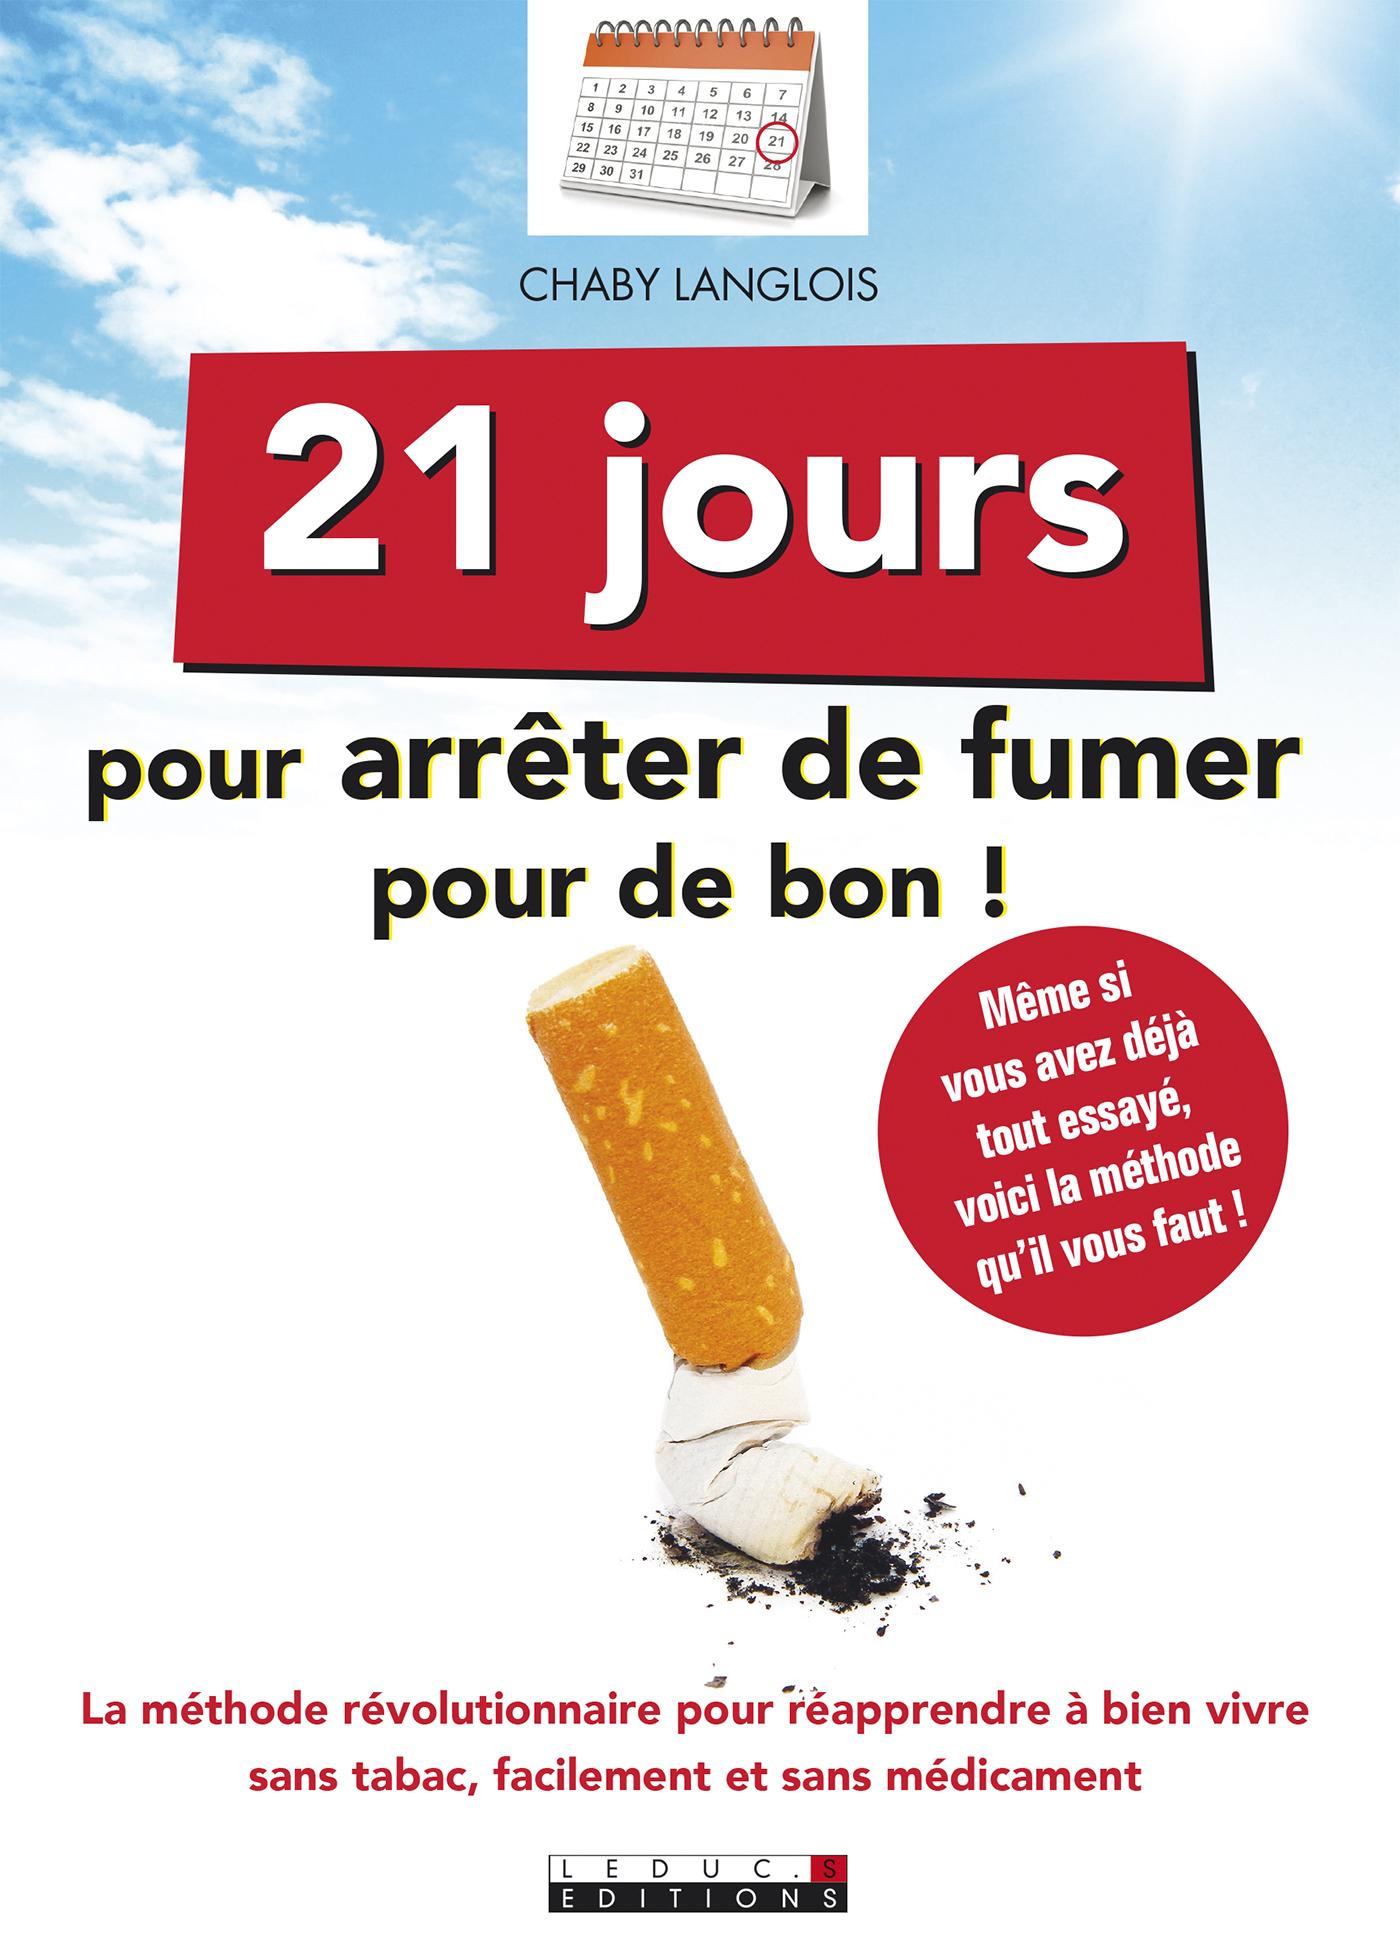 jessaye darreter de fumer